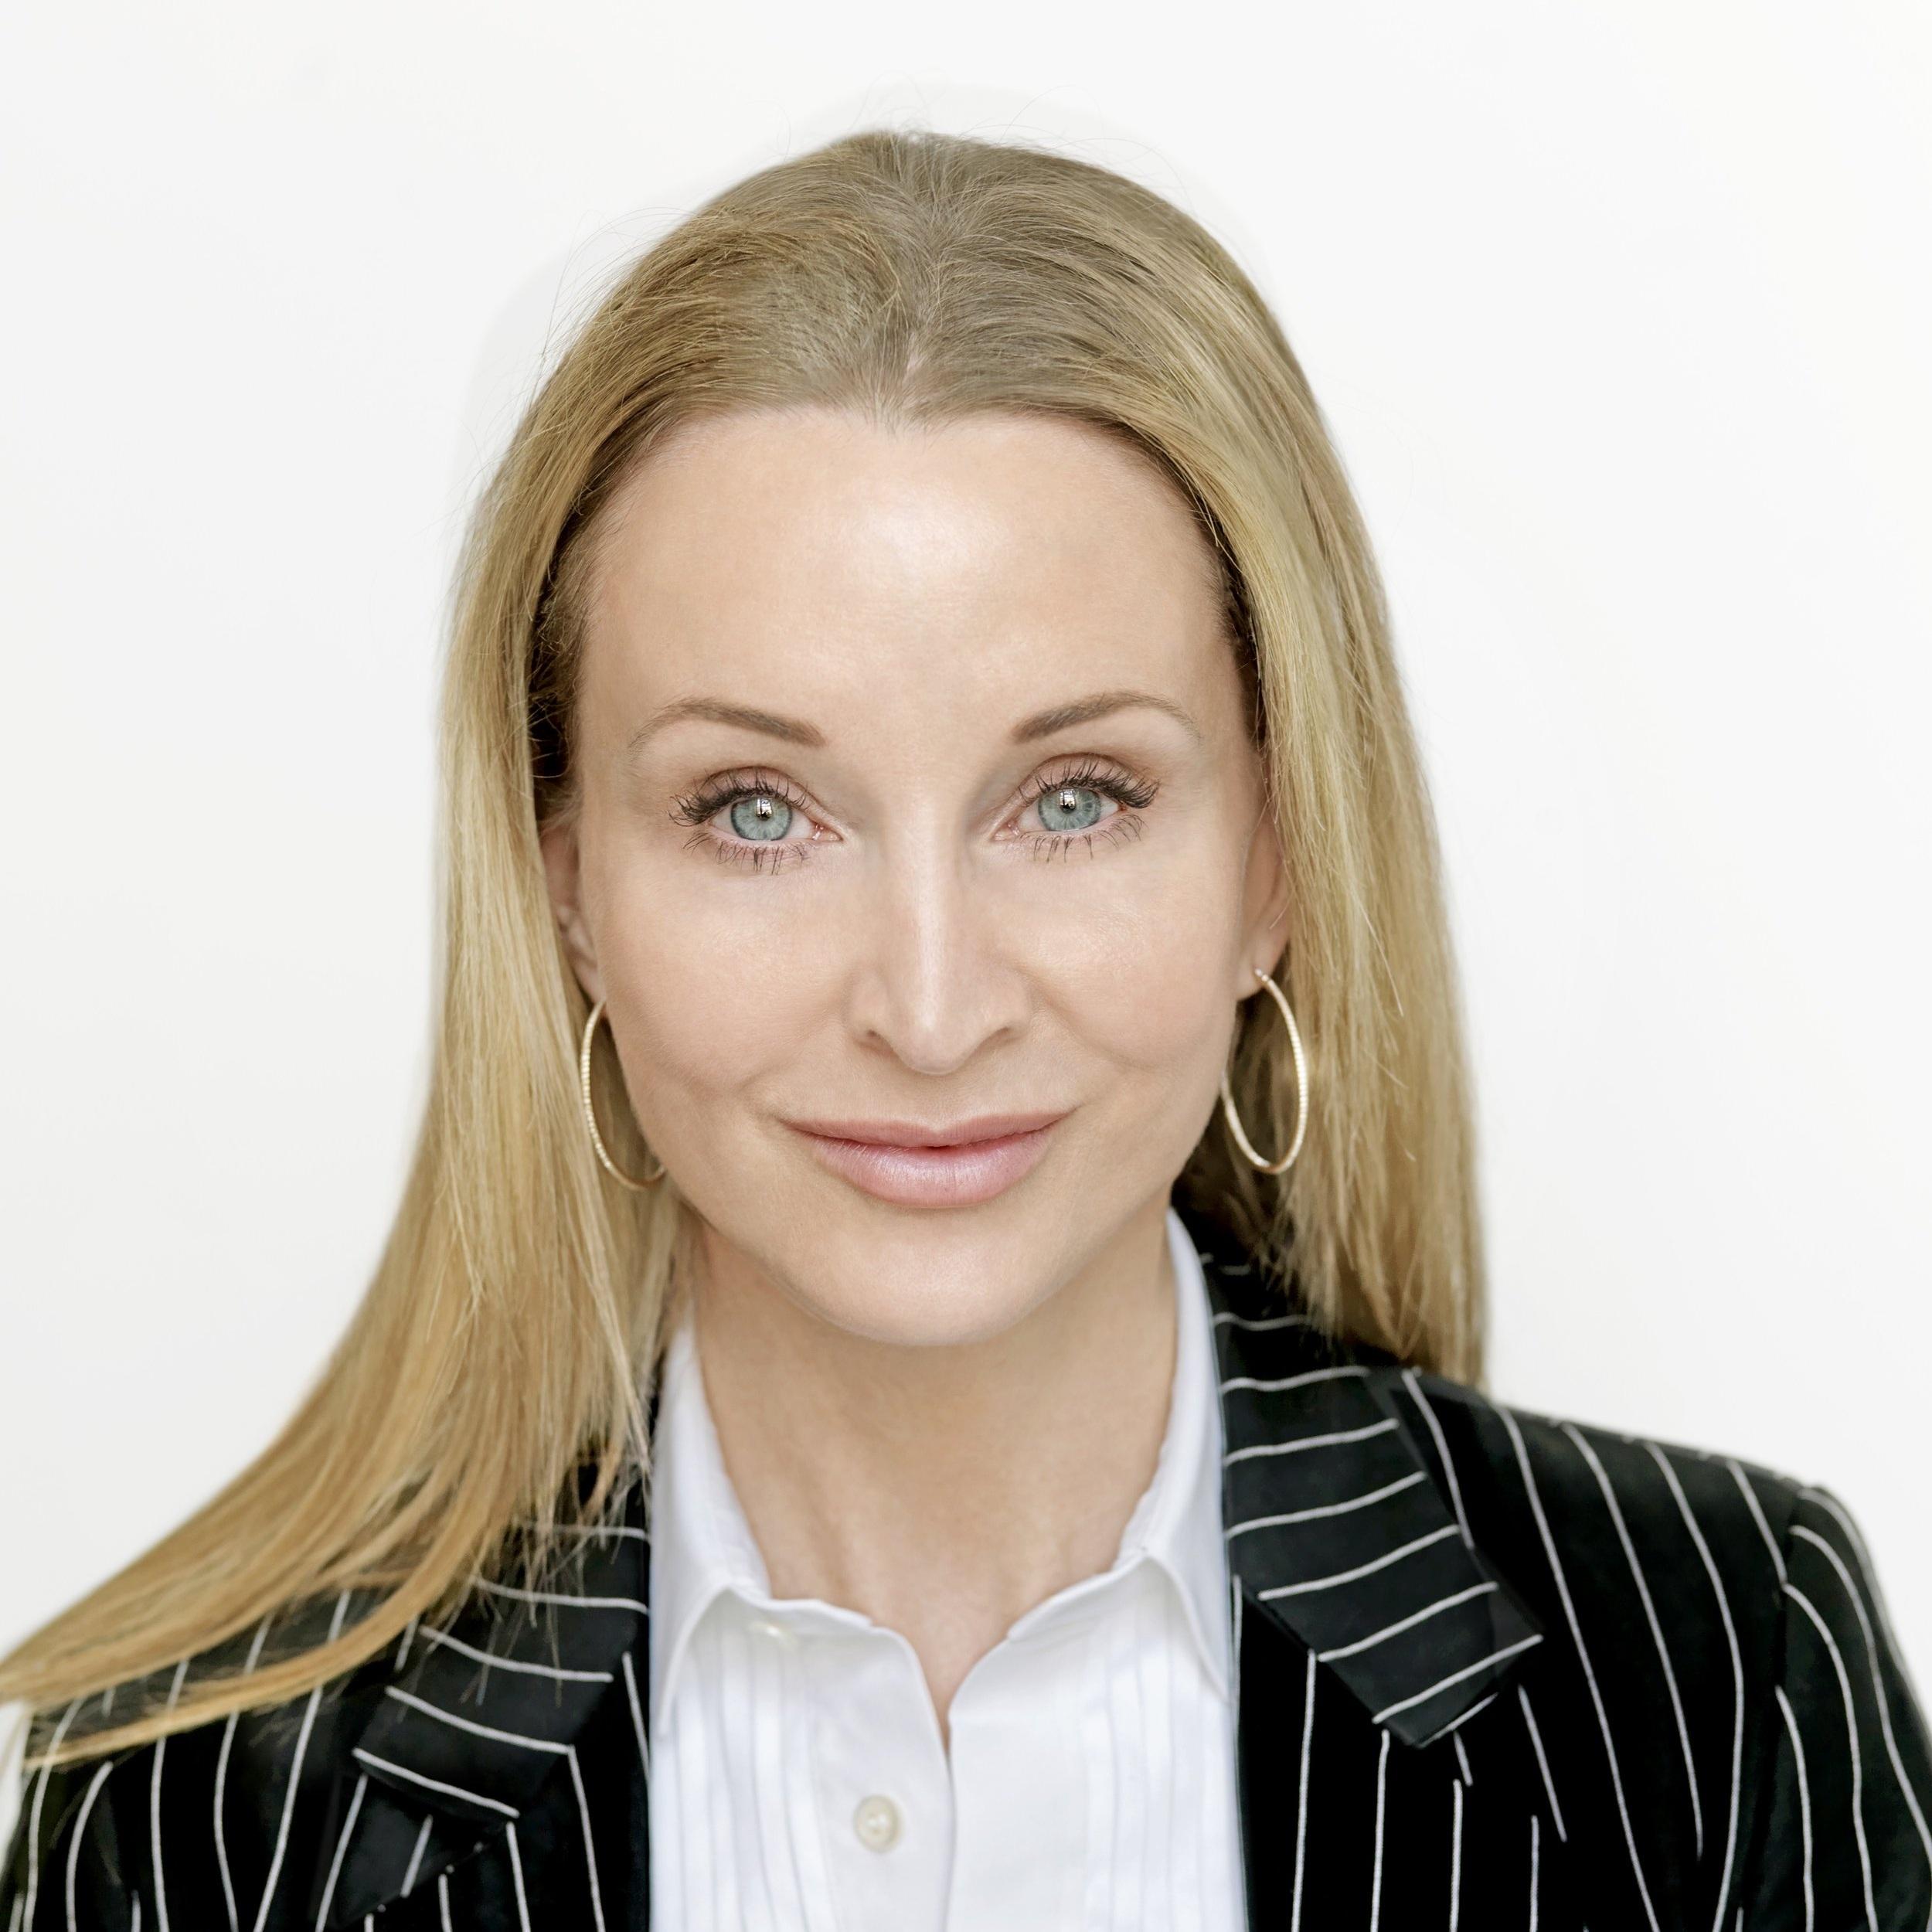 Karen Mulville - Founder & CEO, Age-nda